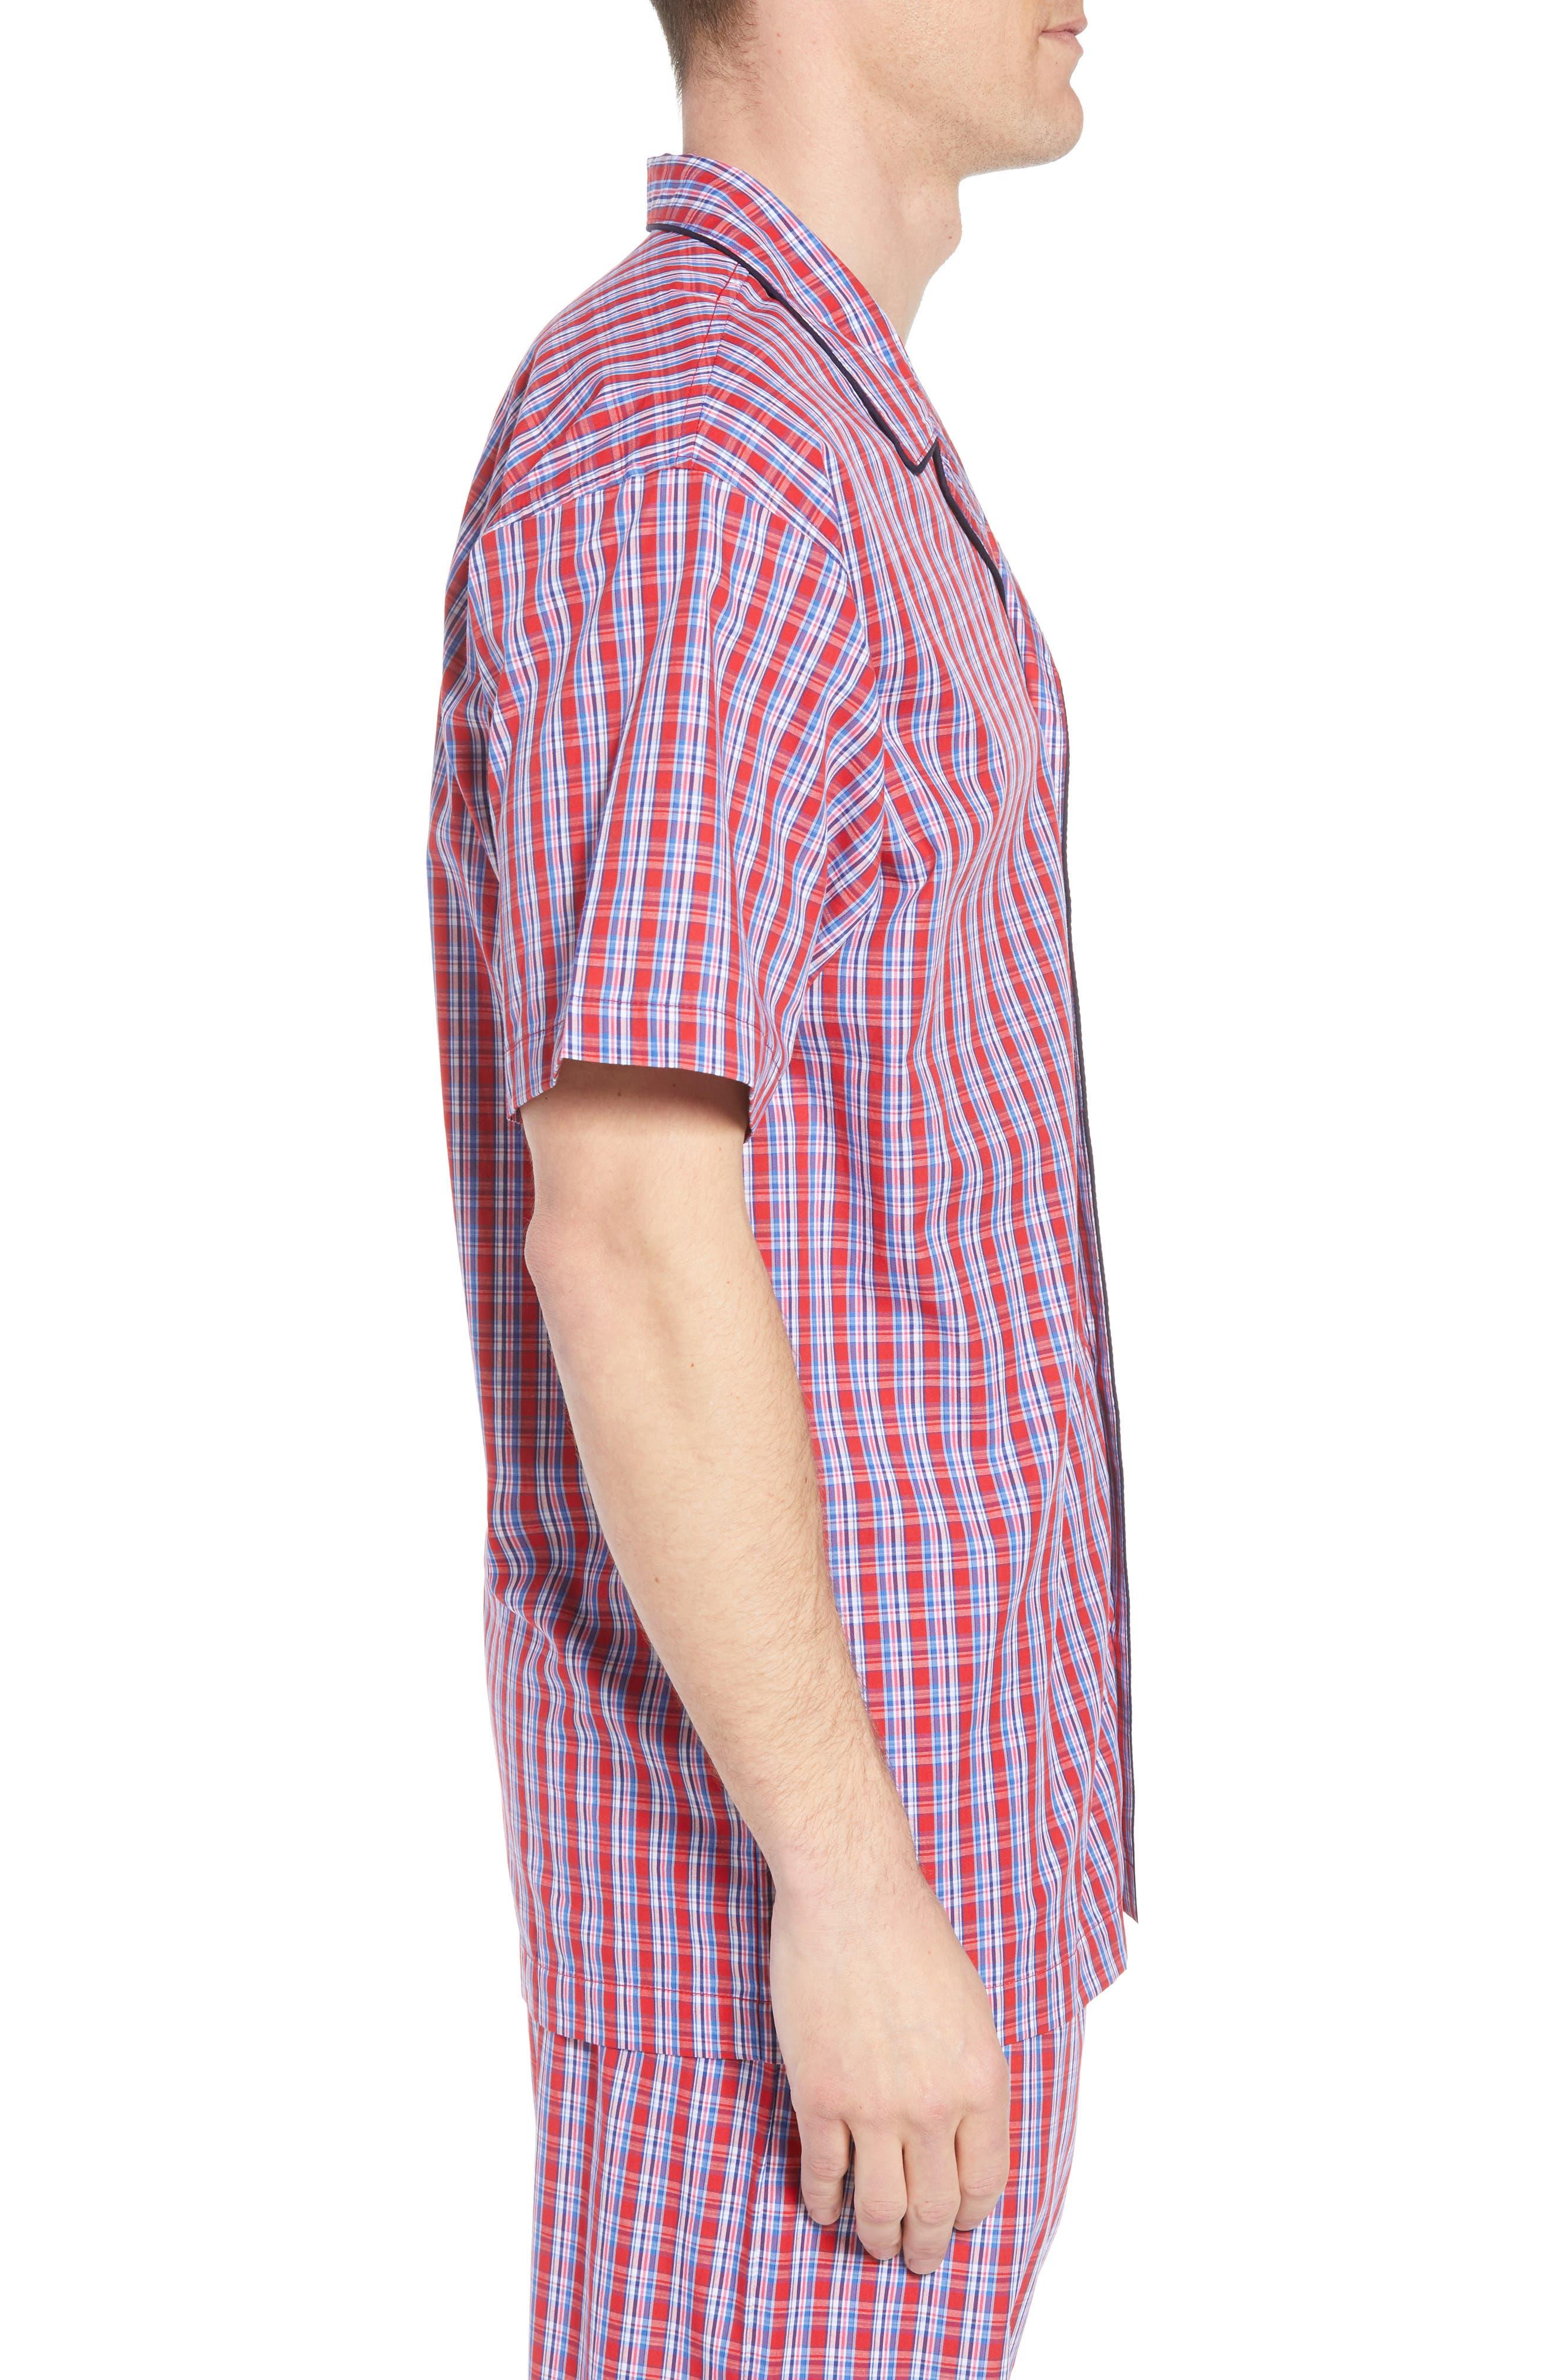 Cotton Pajama Shirt,                             Alternate thumbnail 3, color,                             NEWPORT PLAID/ NAVY